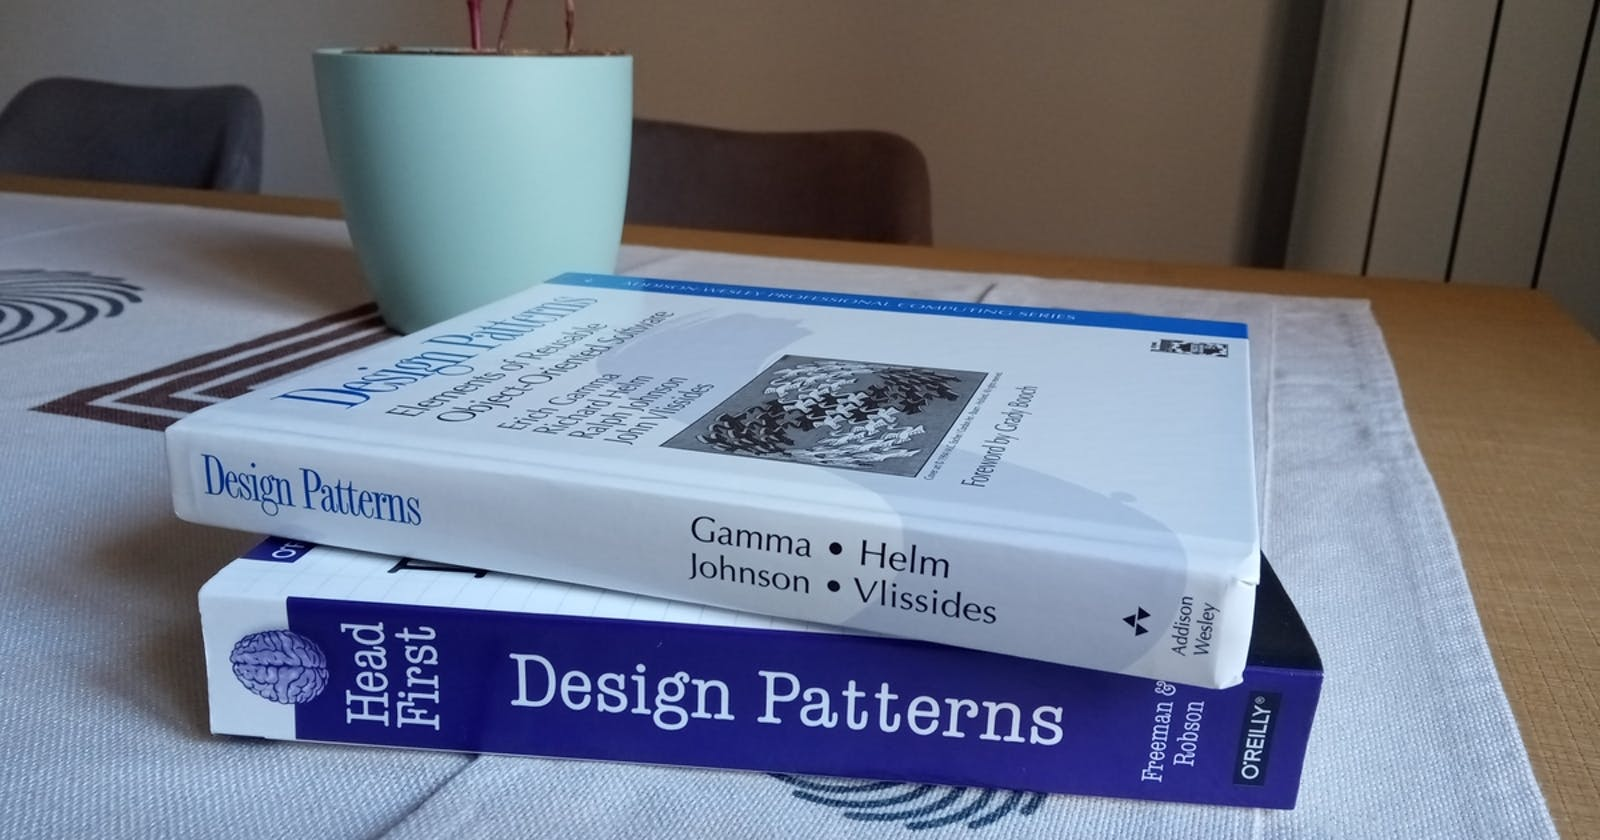 Are design patterns still relevant?